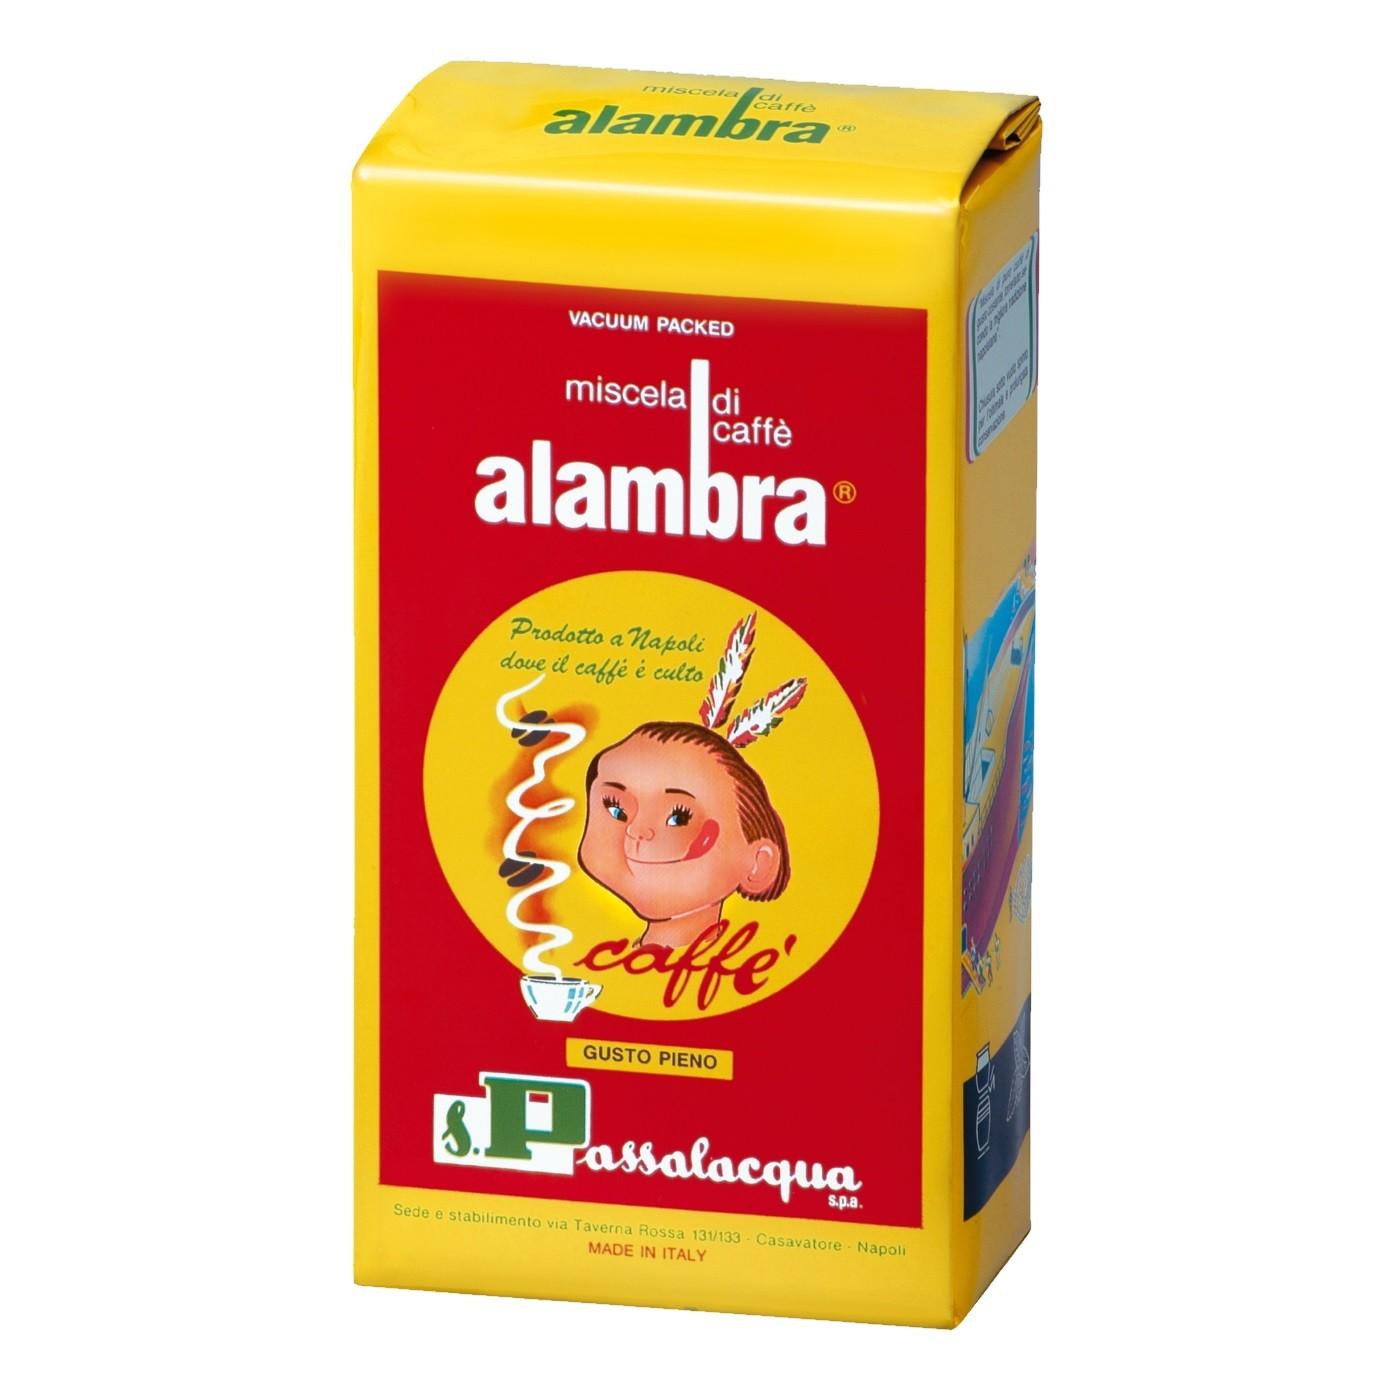 PASSALACQUA Alambra 24x 250 g gemahlen und vakuumiert